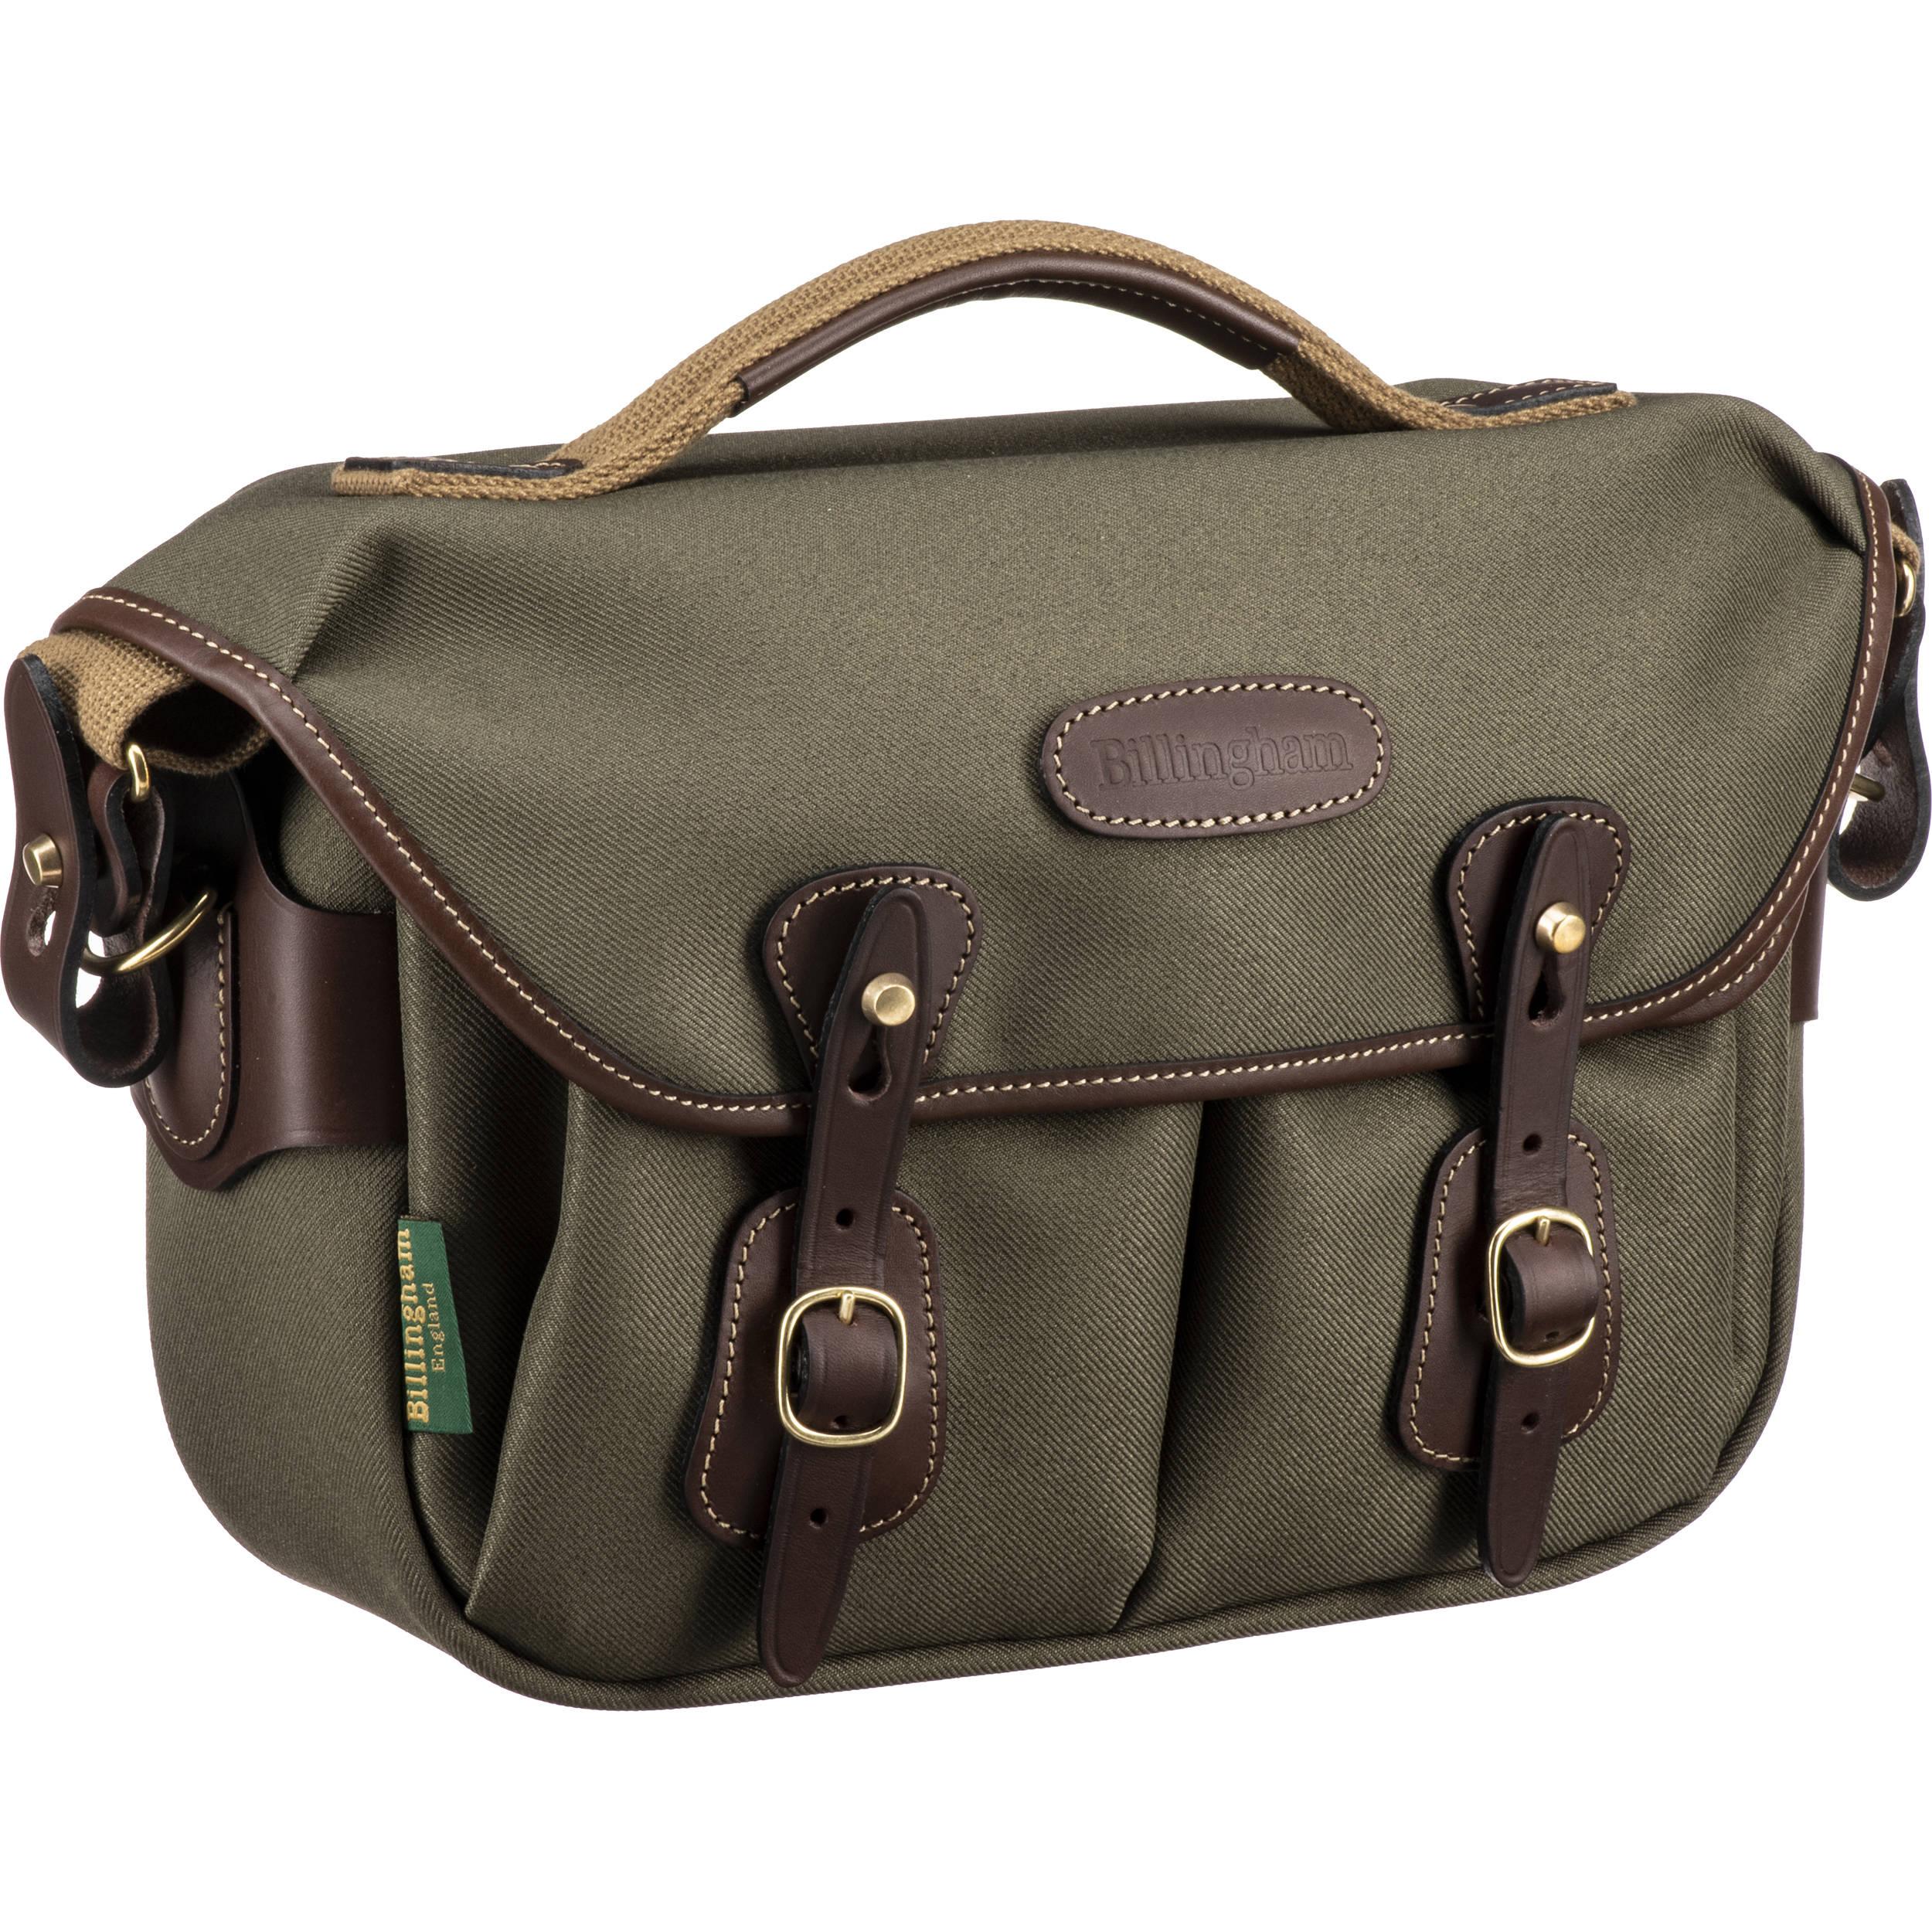 Billingham Hadley Small Pro Shoulder Bag (Sage FibreNyte   Chocolate  Leather) 13068c2f6b4